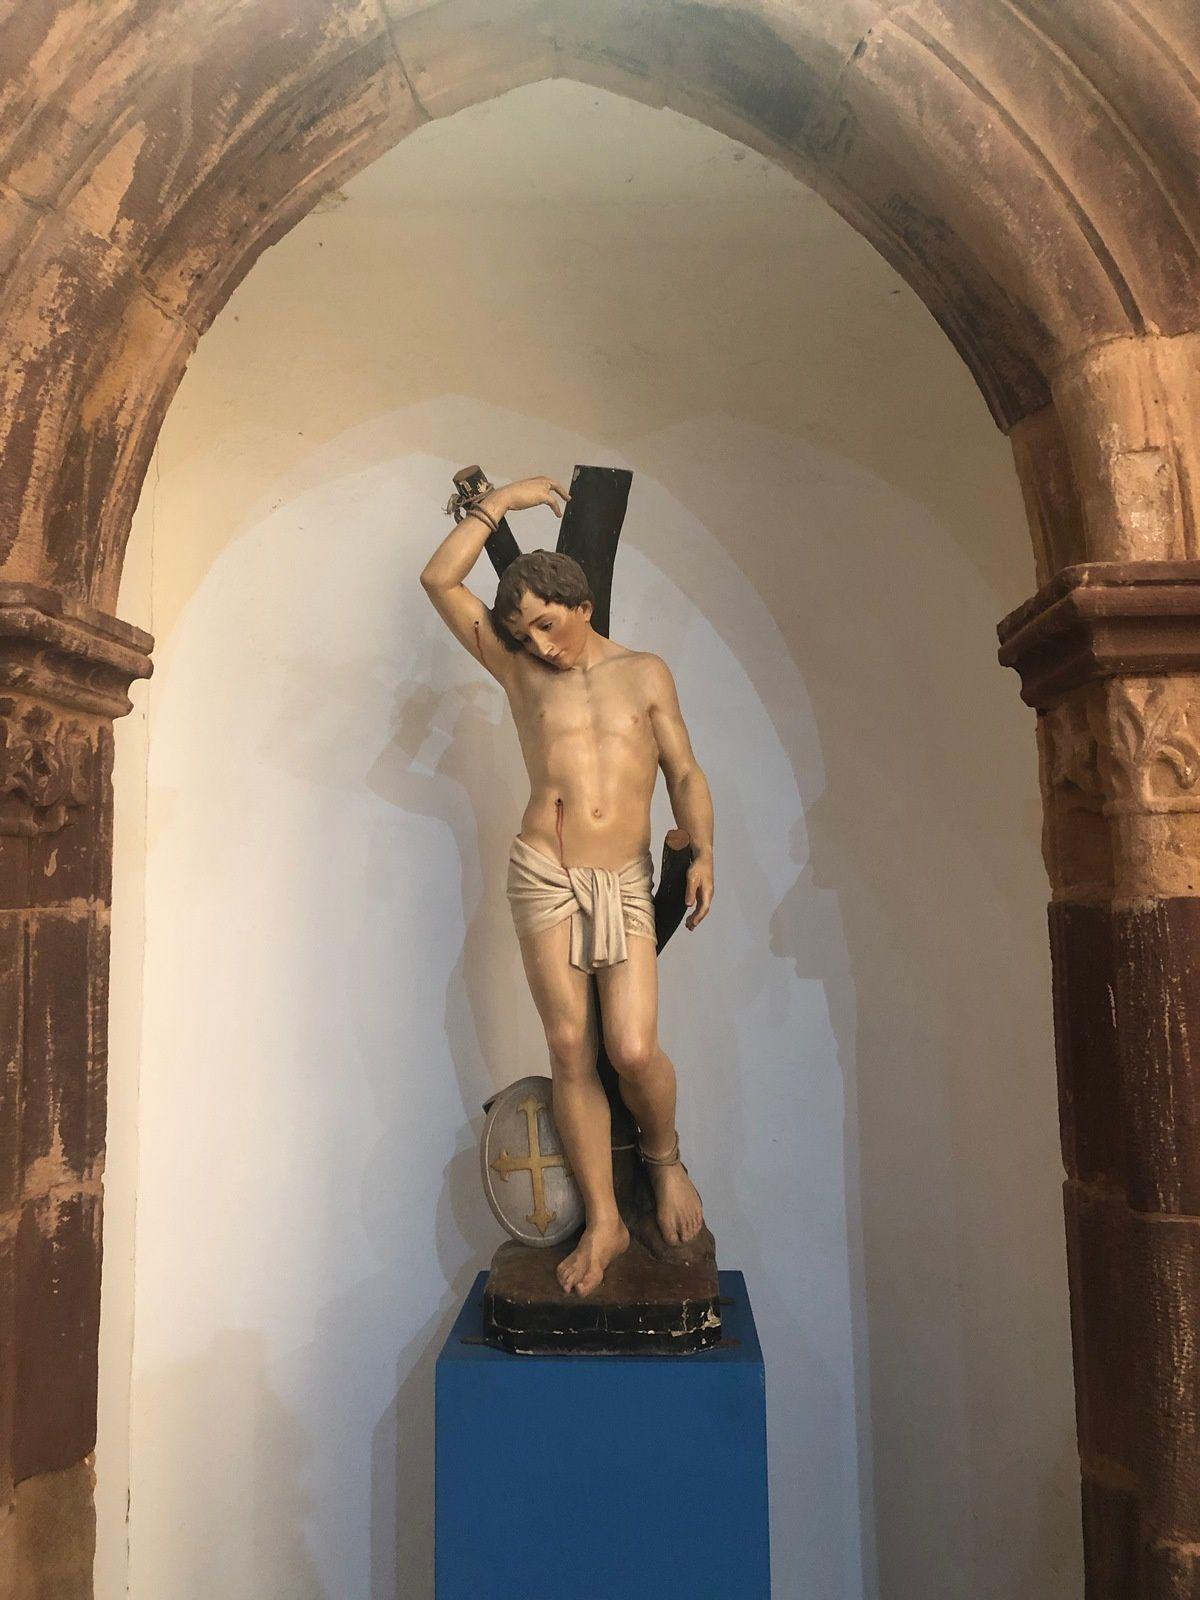 La cathédrale de Silves en Algarve.